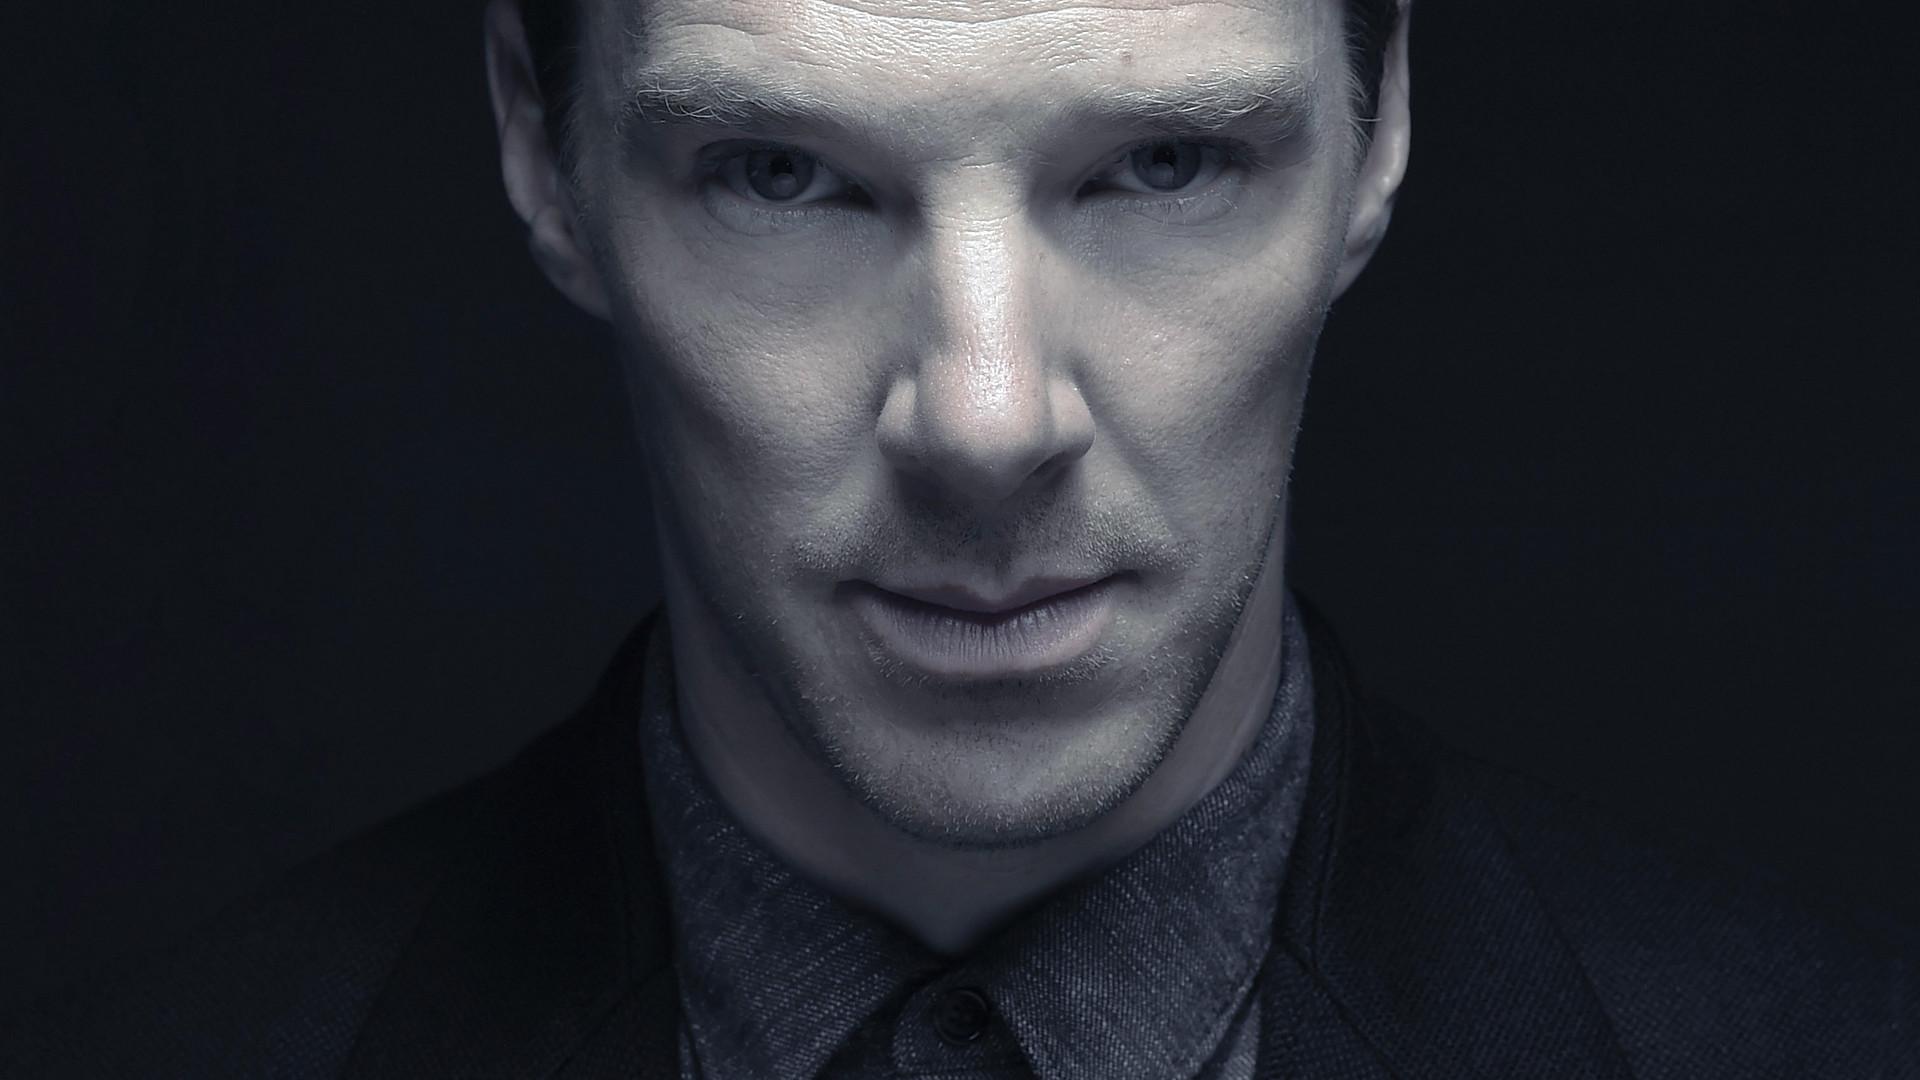 Benedict Cumberbatch Sherlock Wallpaper (82+ images)